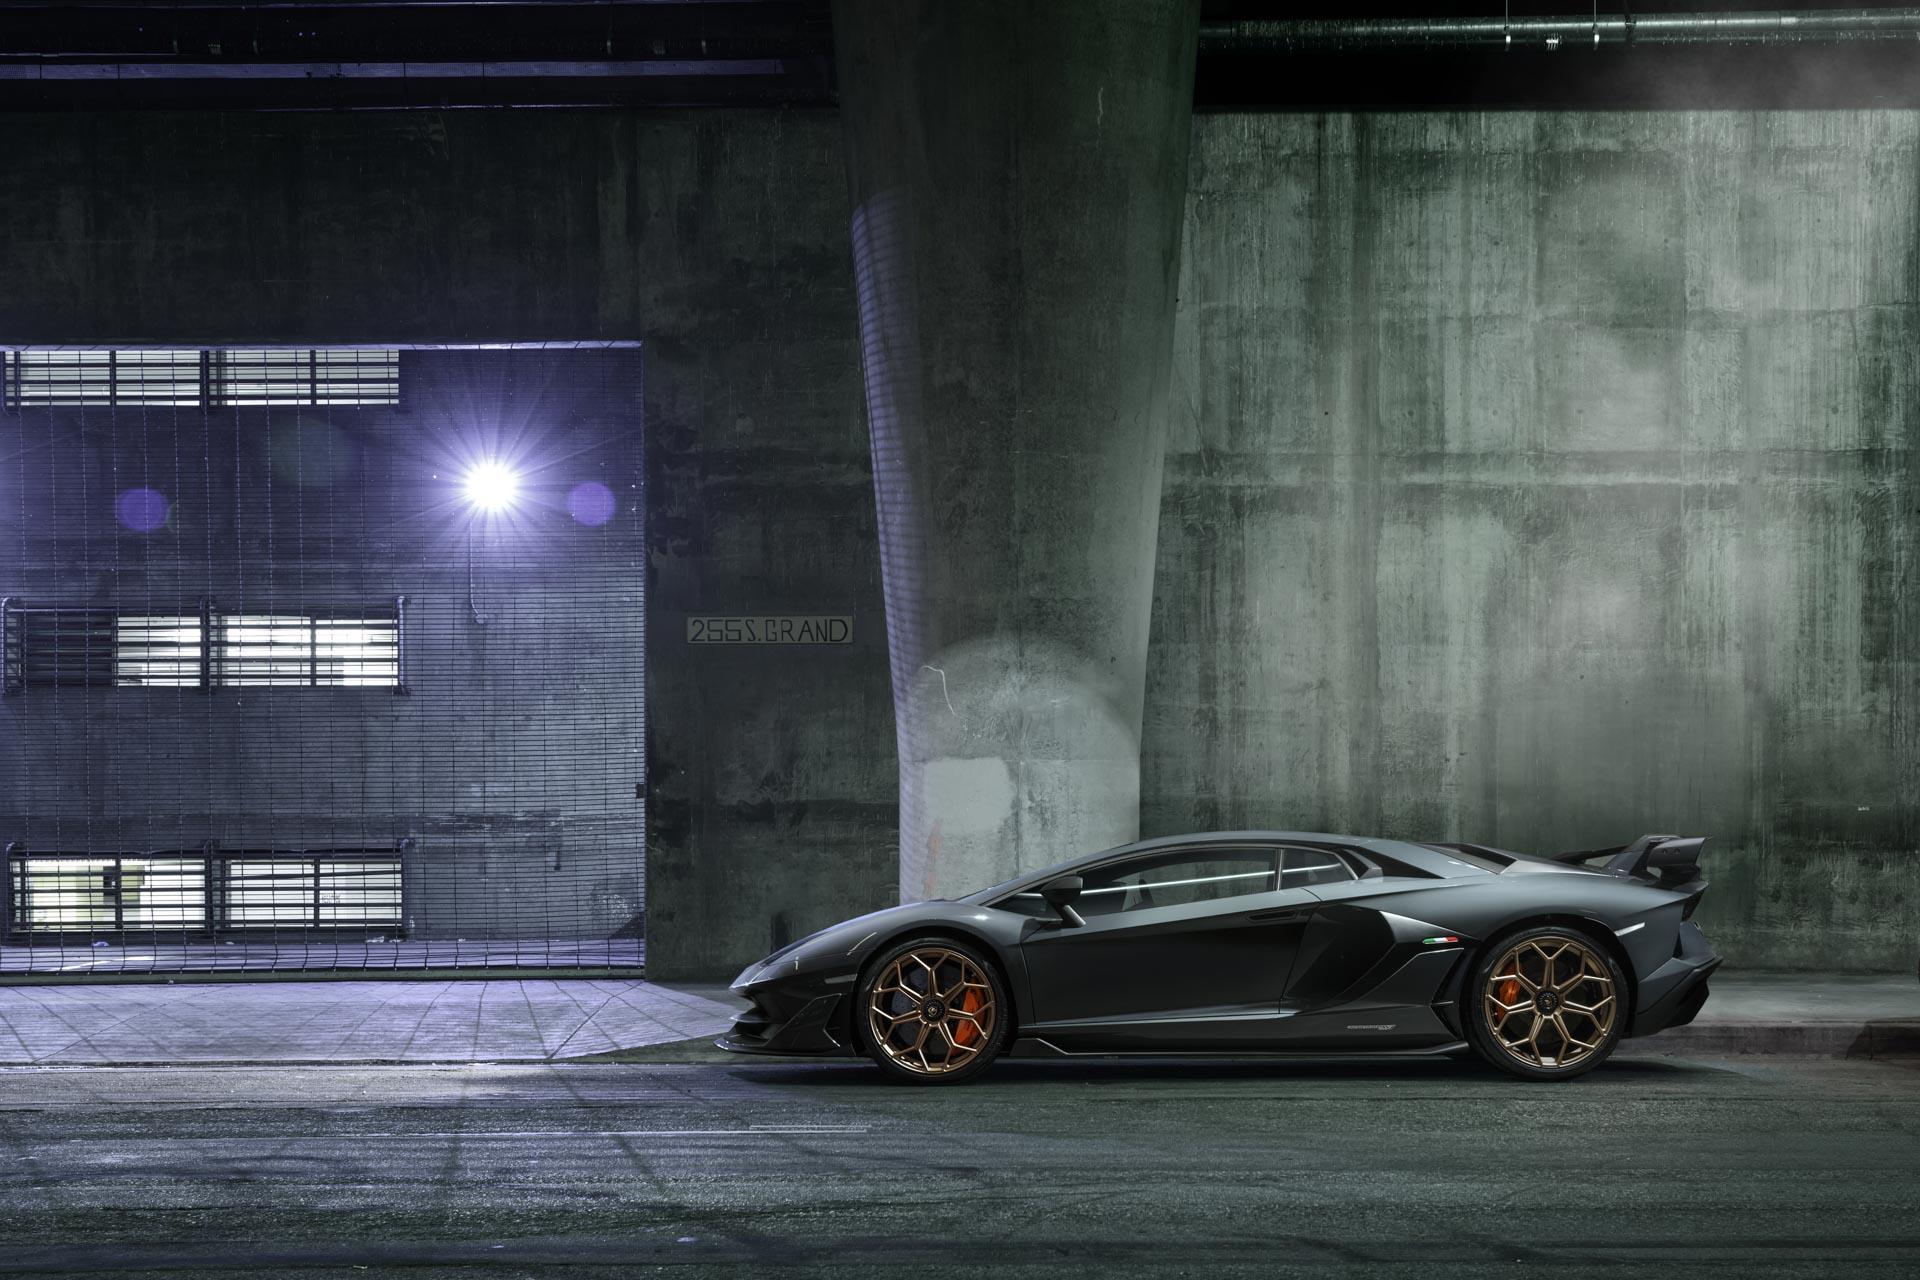 Lamborghini Aventador in Los Angeles